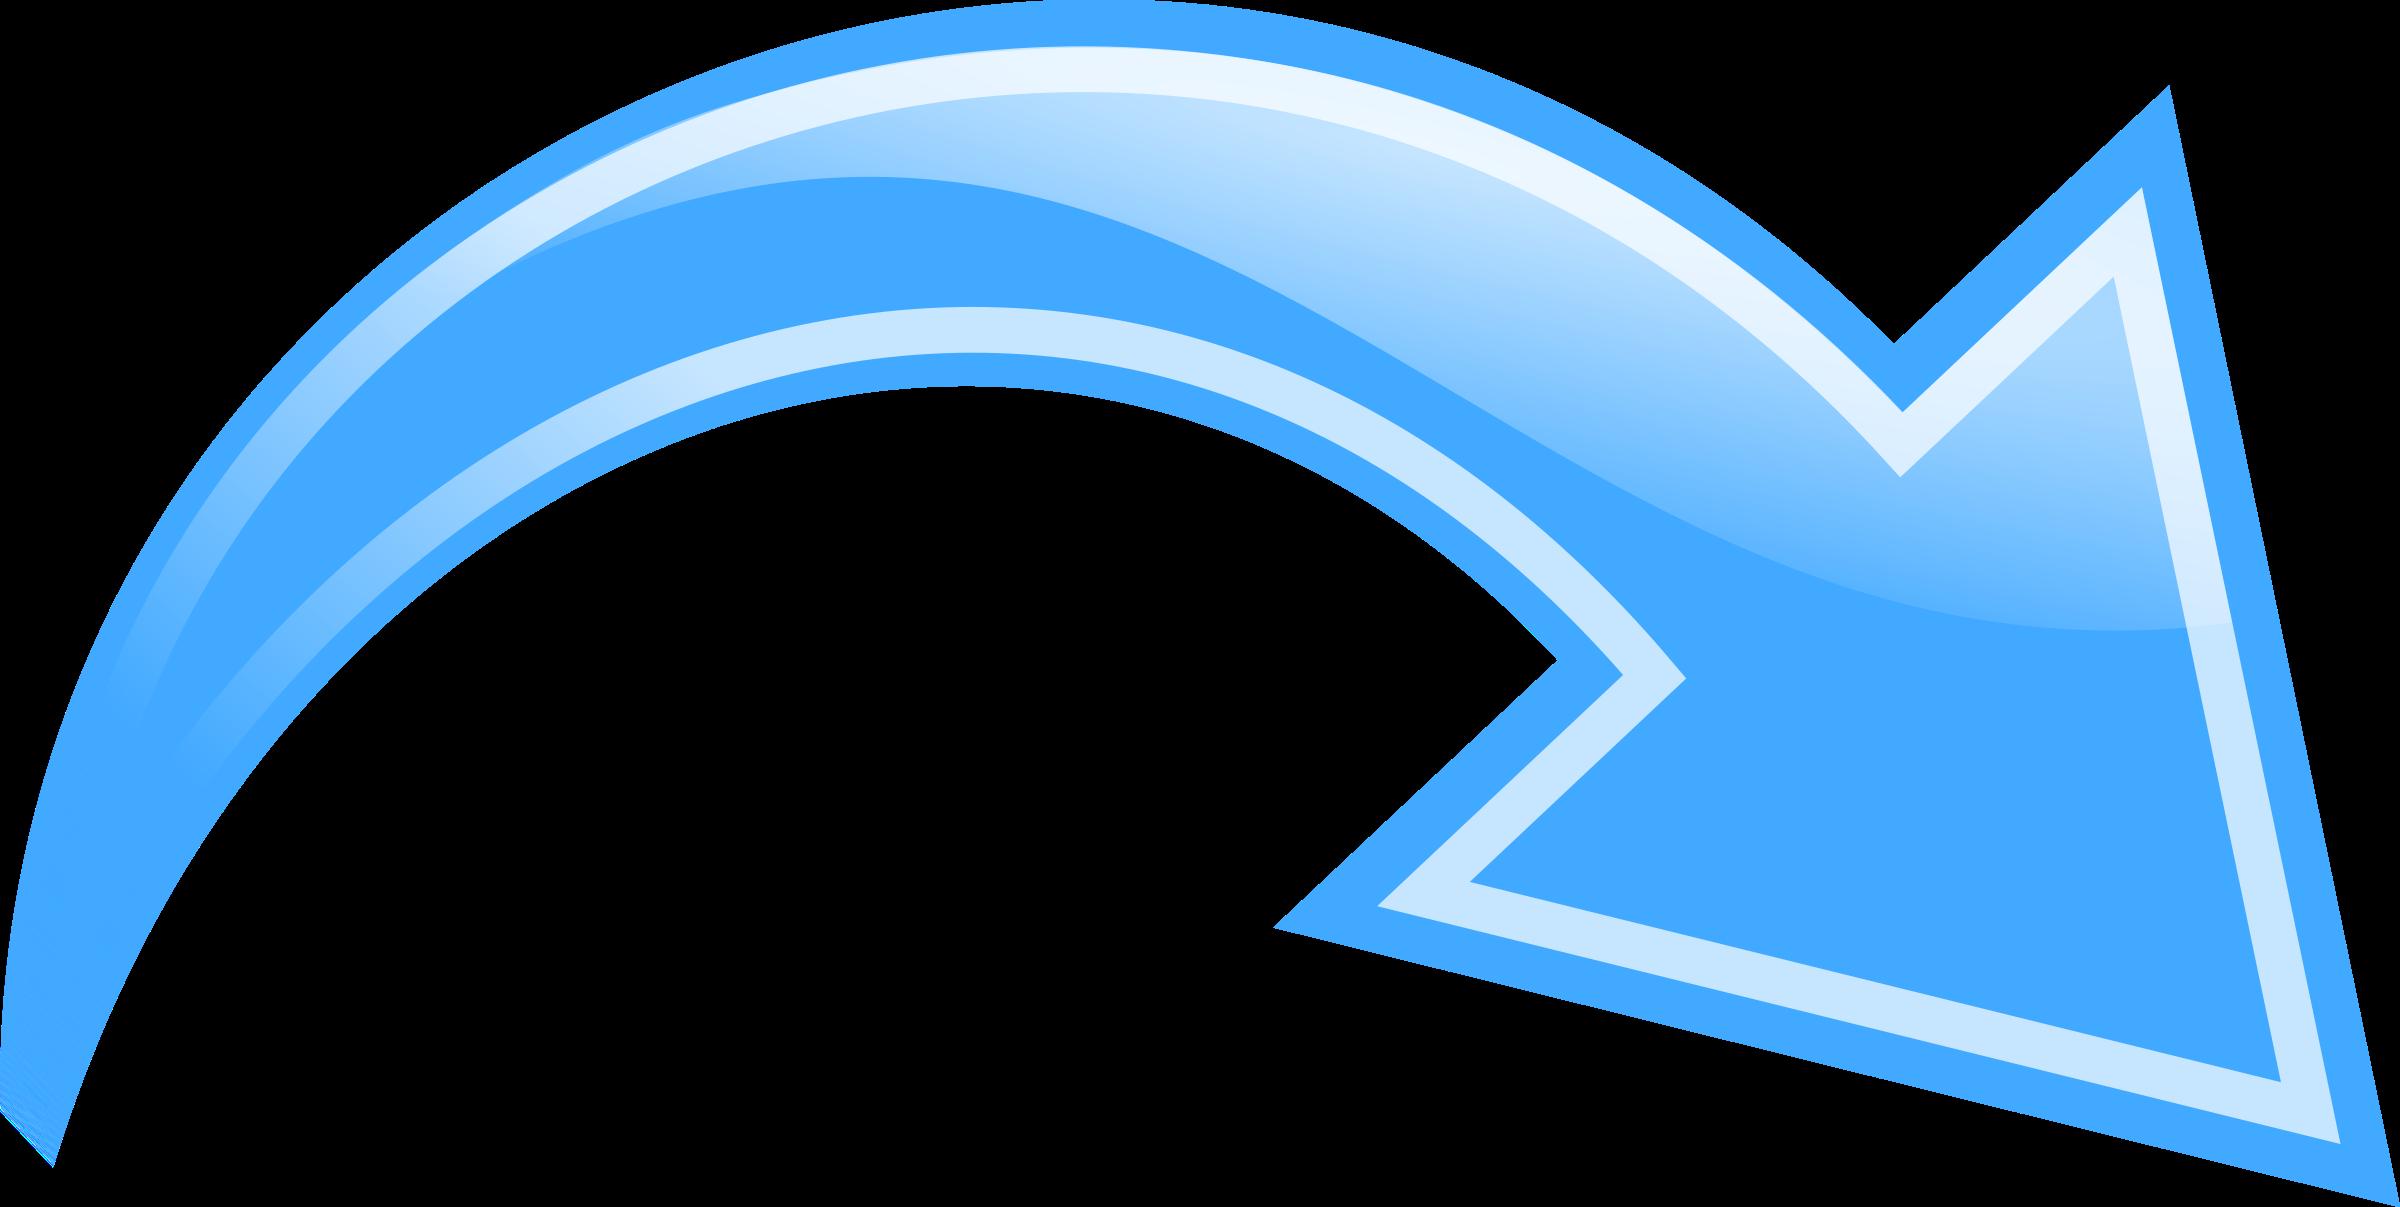 2400x1207 Arrow Clip Art